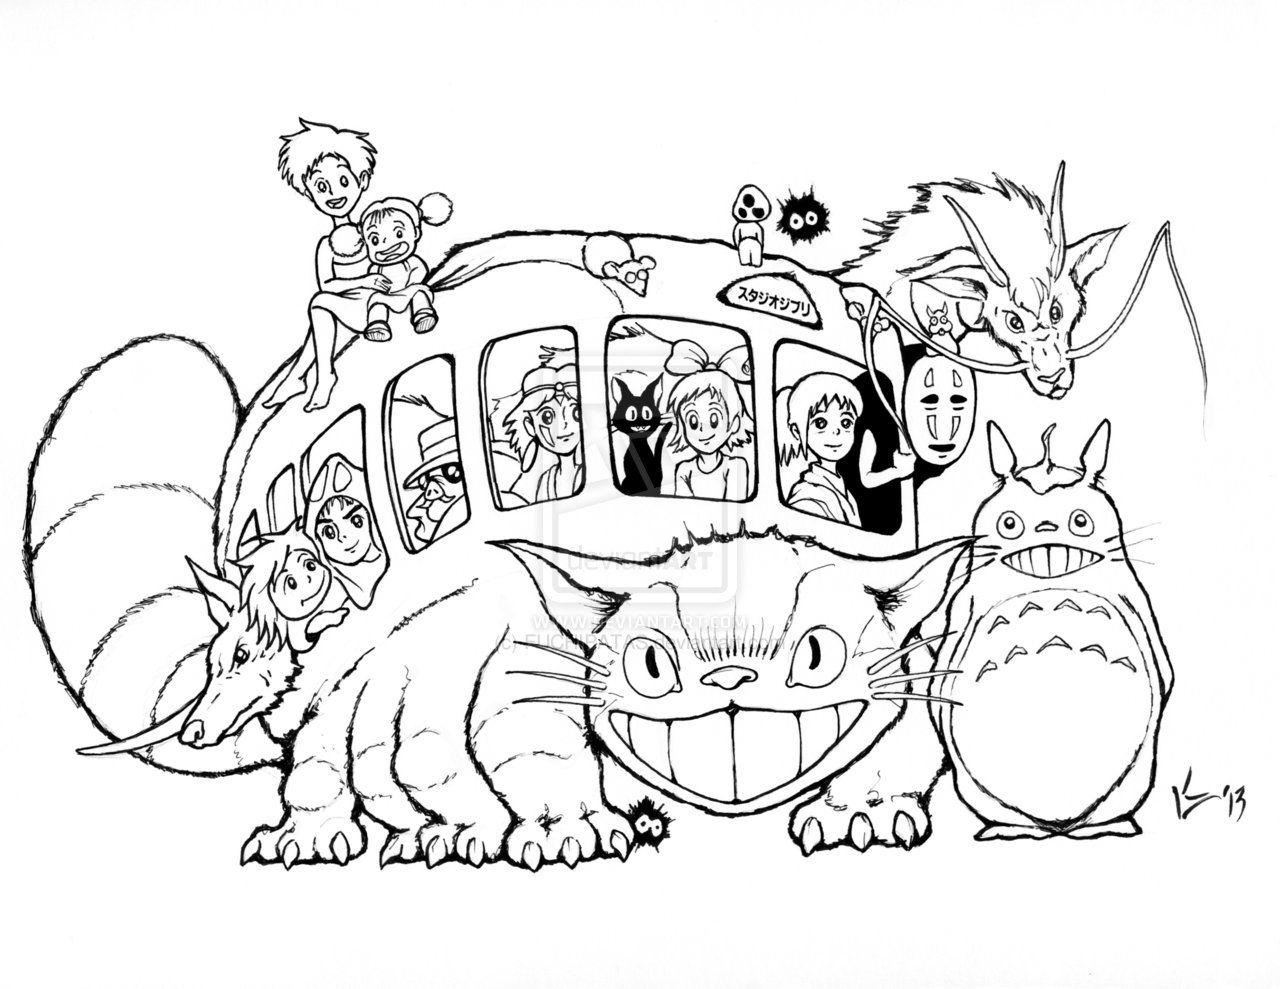 Studio Ghibli Catbus for AICN Contest - INKS by FUCHIPATAS